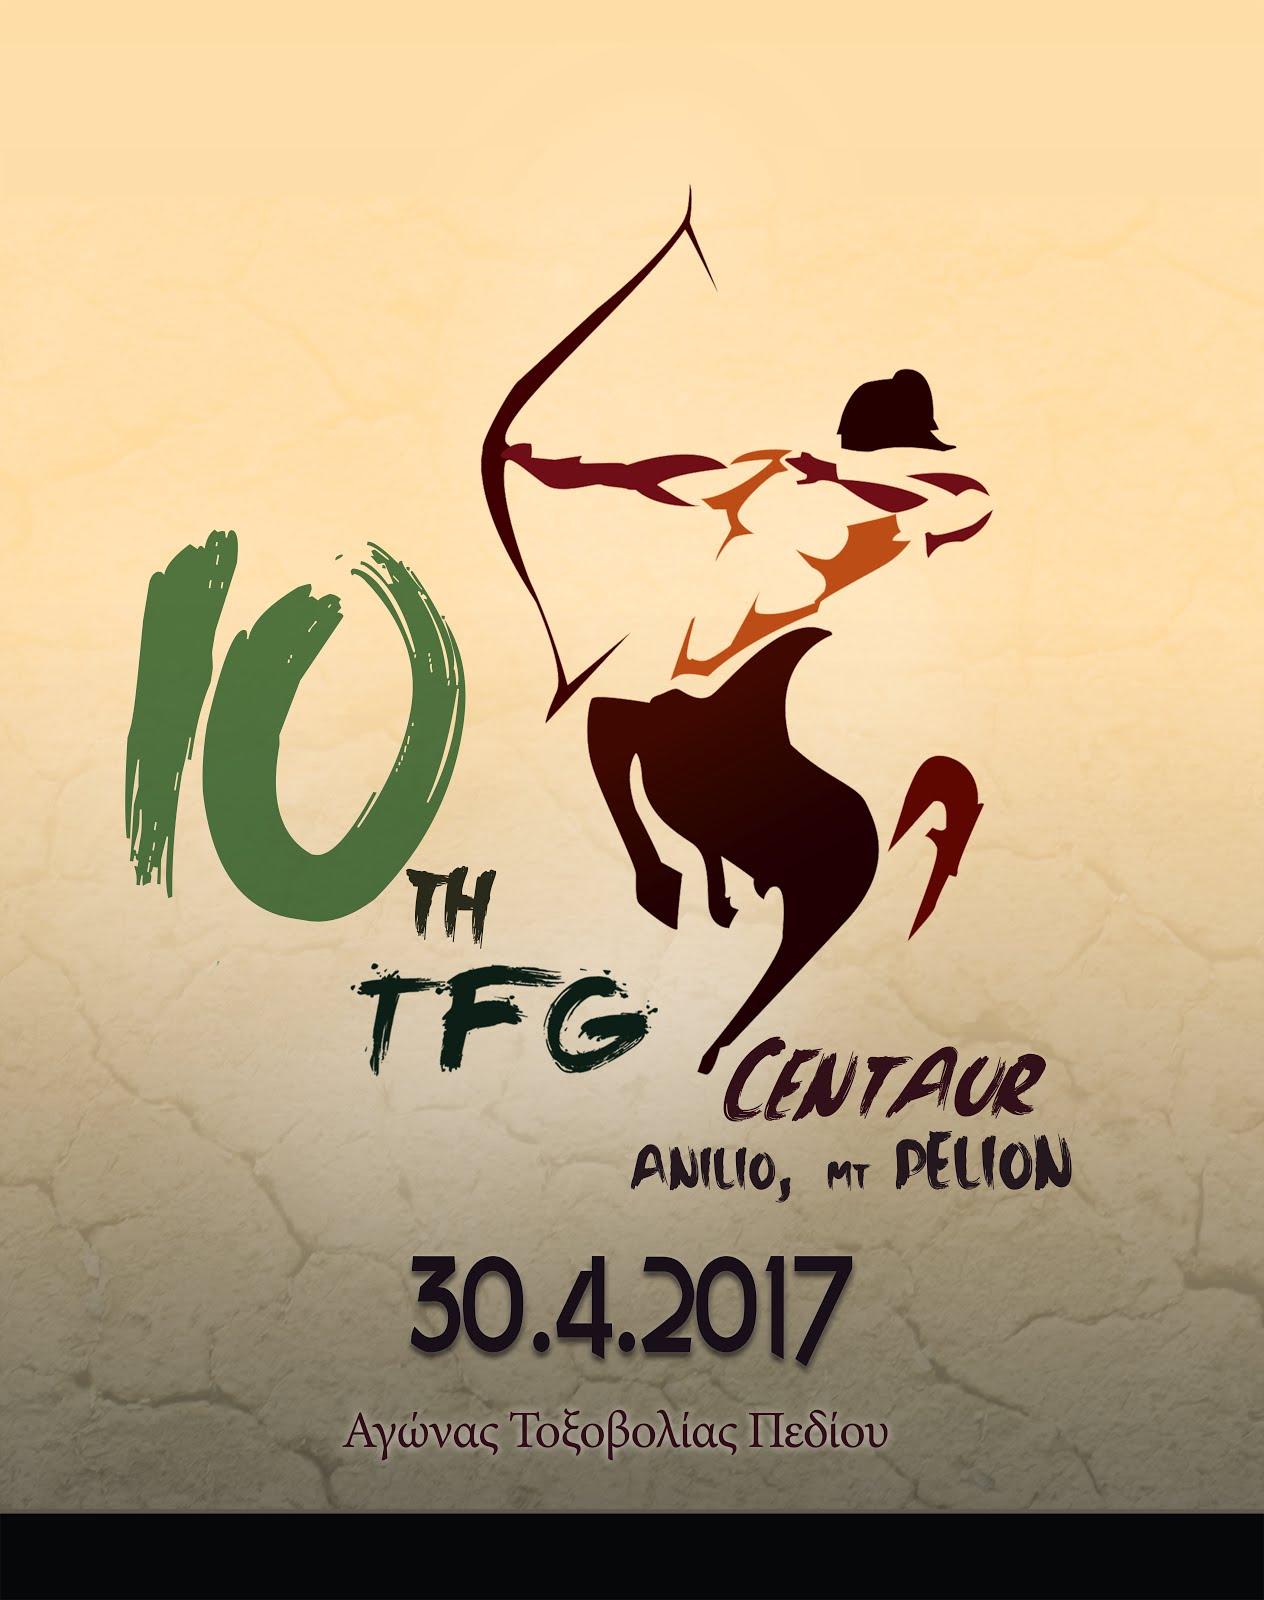 10th TFG! Anilio, mt Pelion.